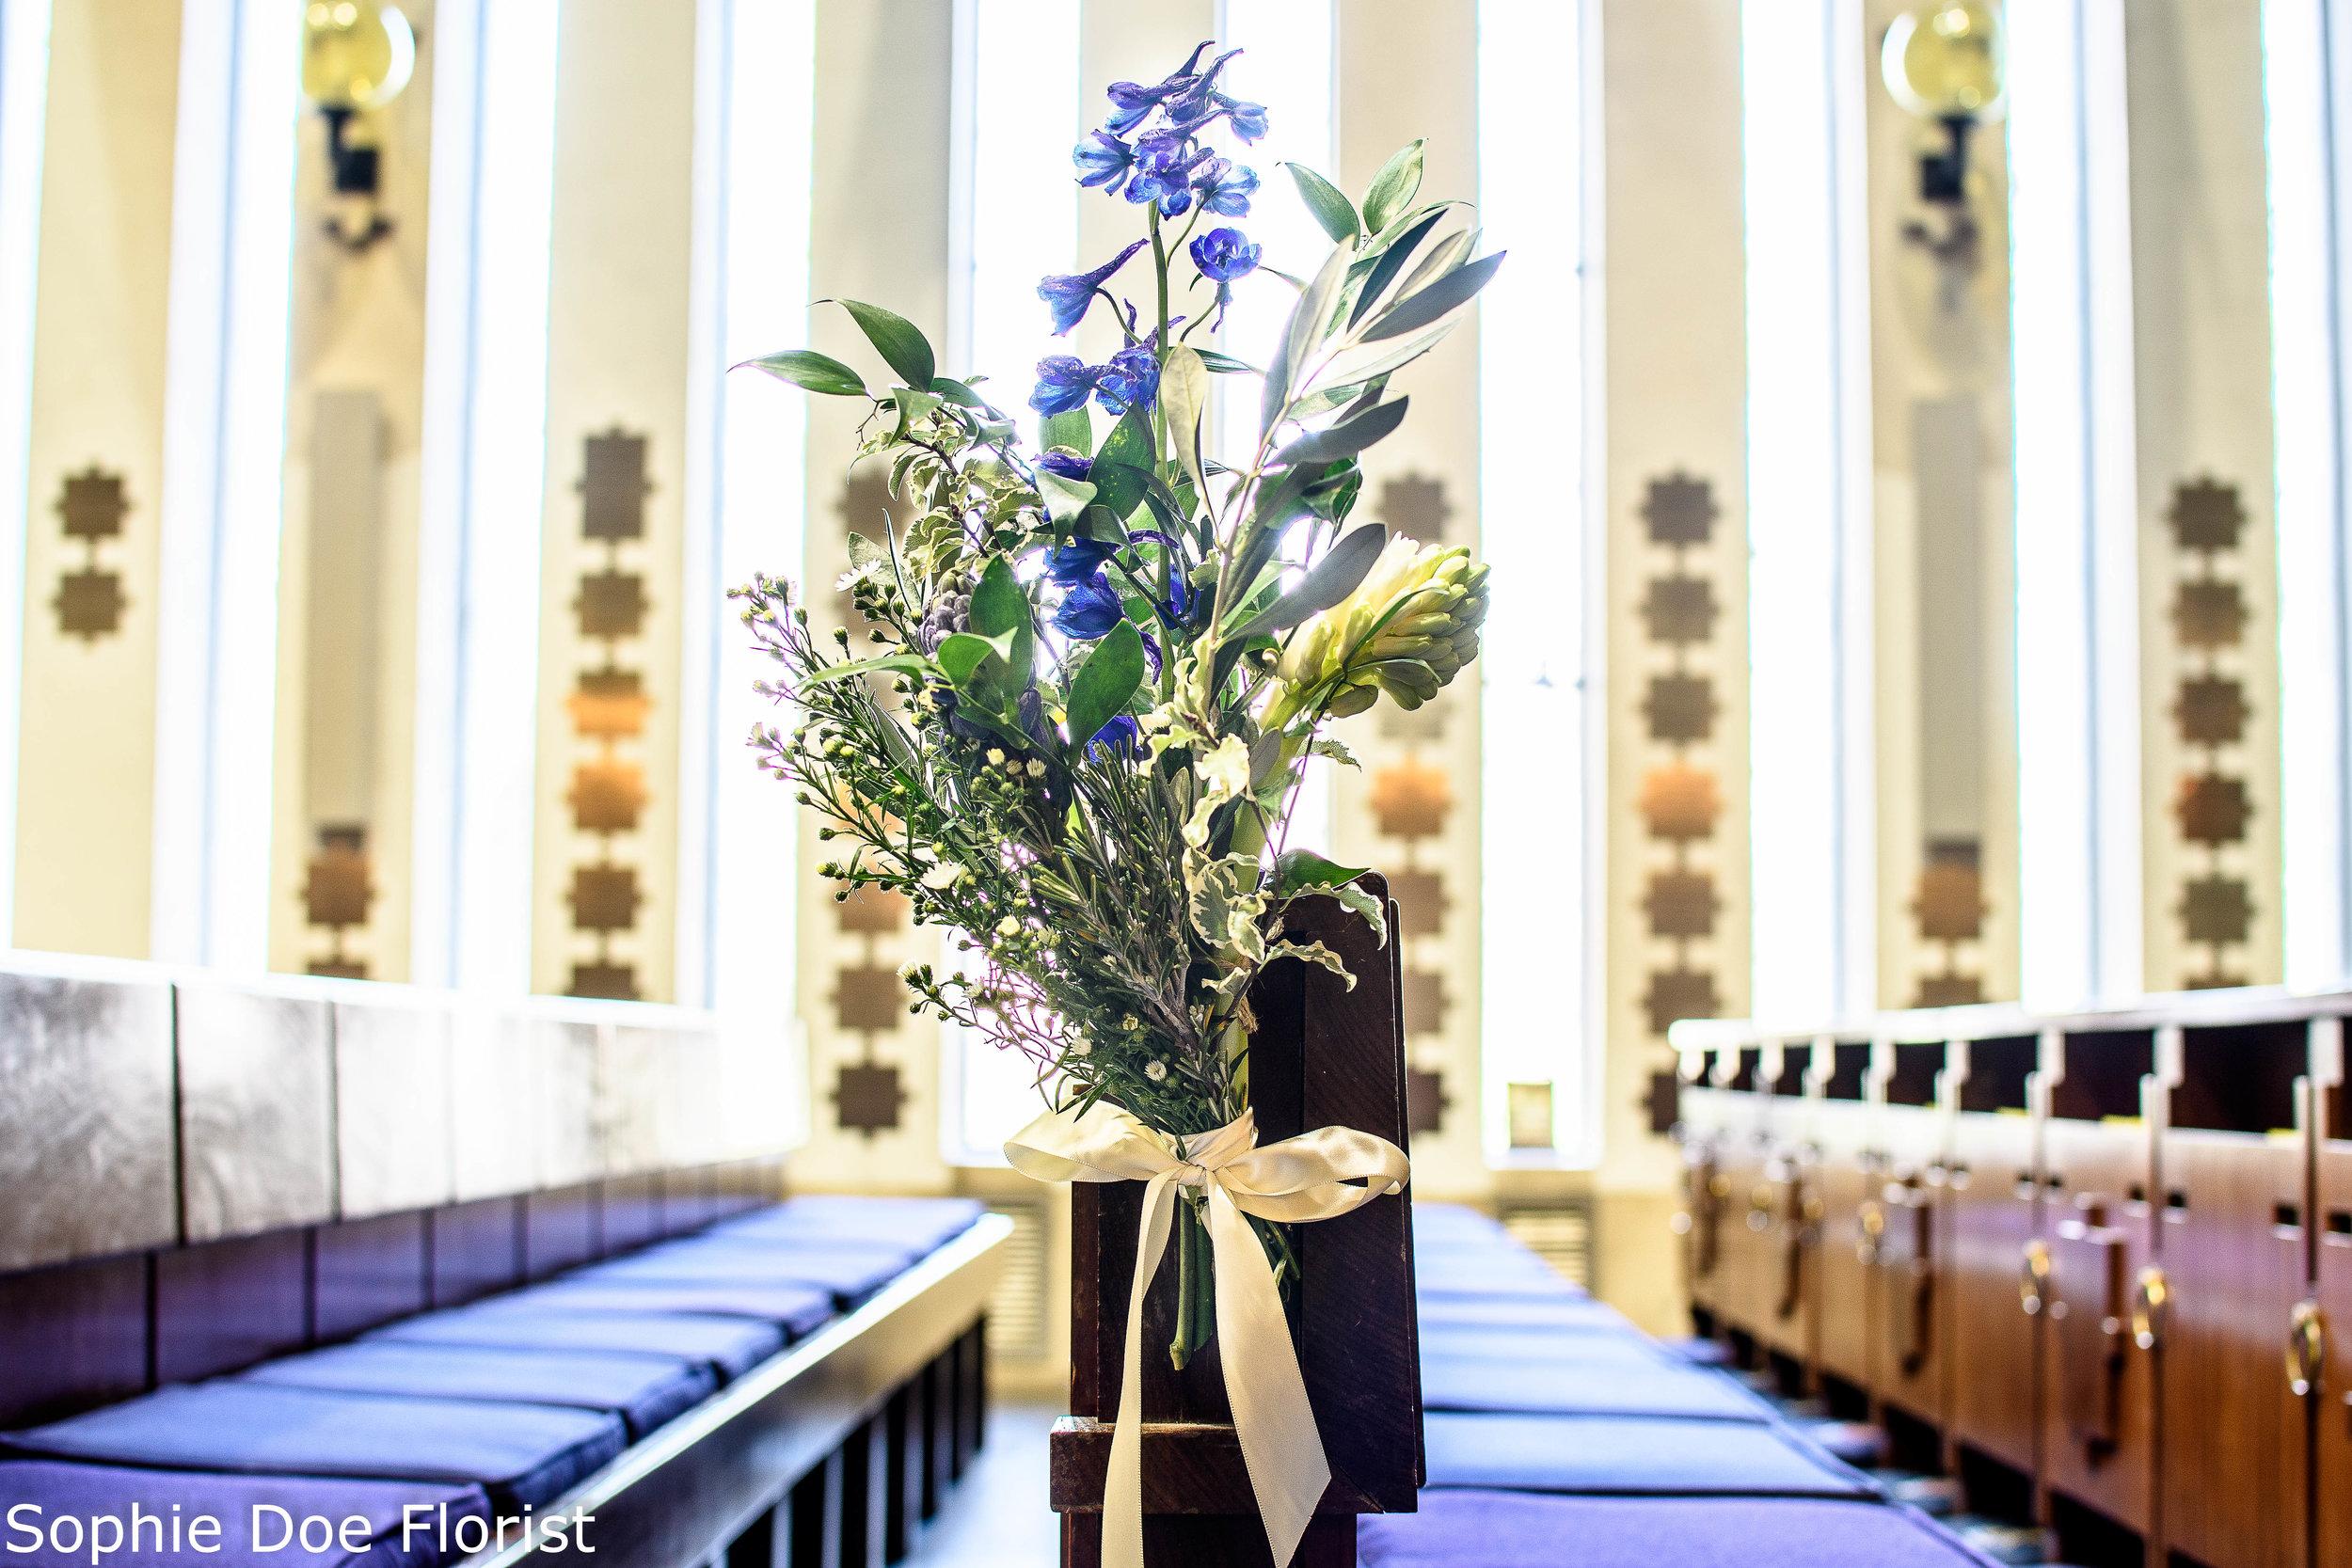 Sophie Doe Florist Wedding Flowers Blue and White